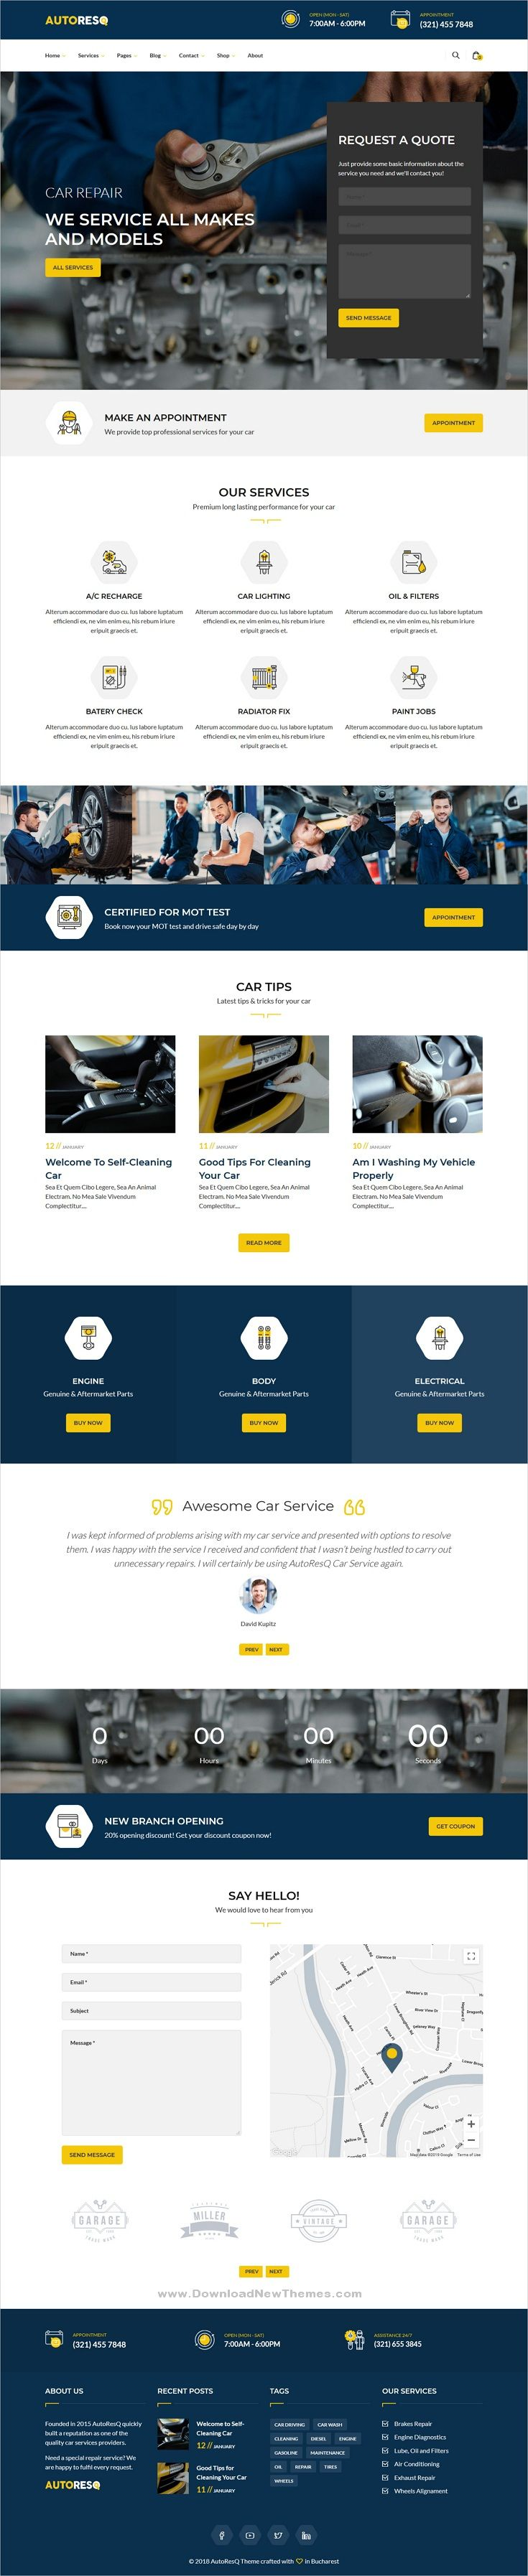 Autoresq Car Repair Wordpress Theme Car Repair Service Auto Service Auto Repair